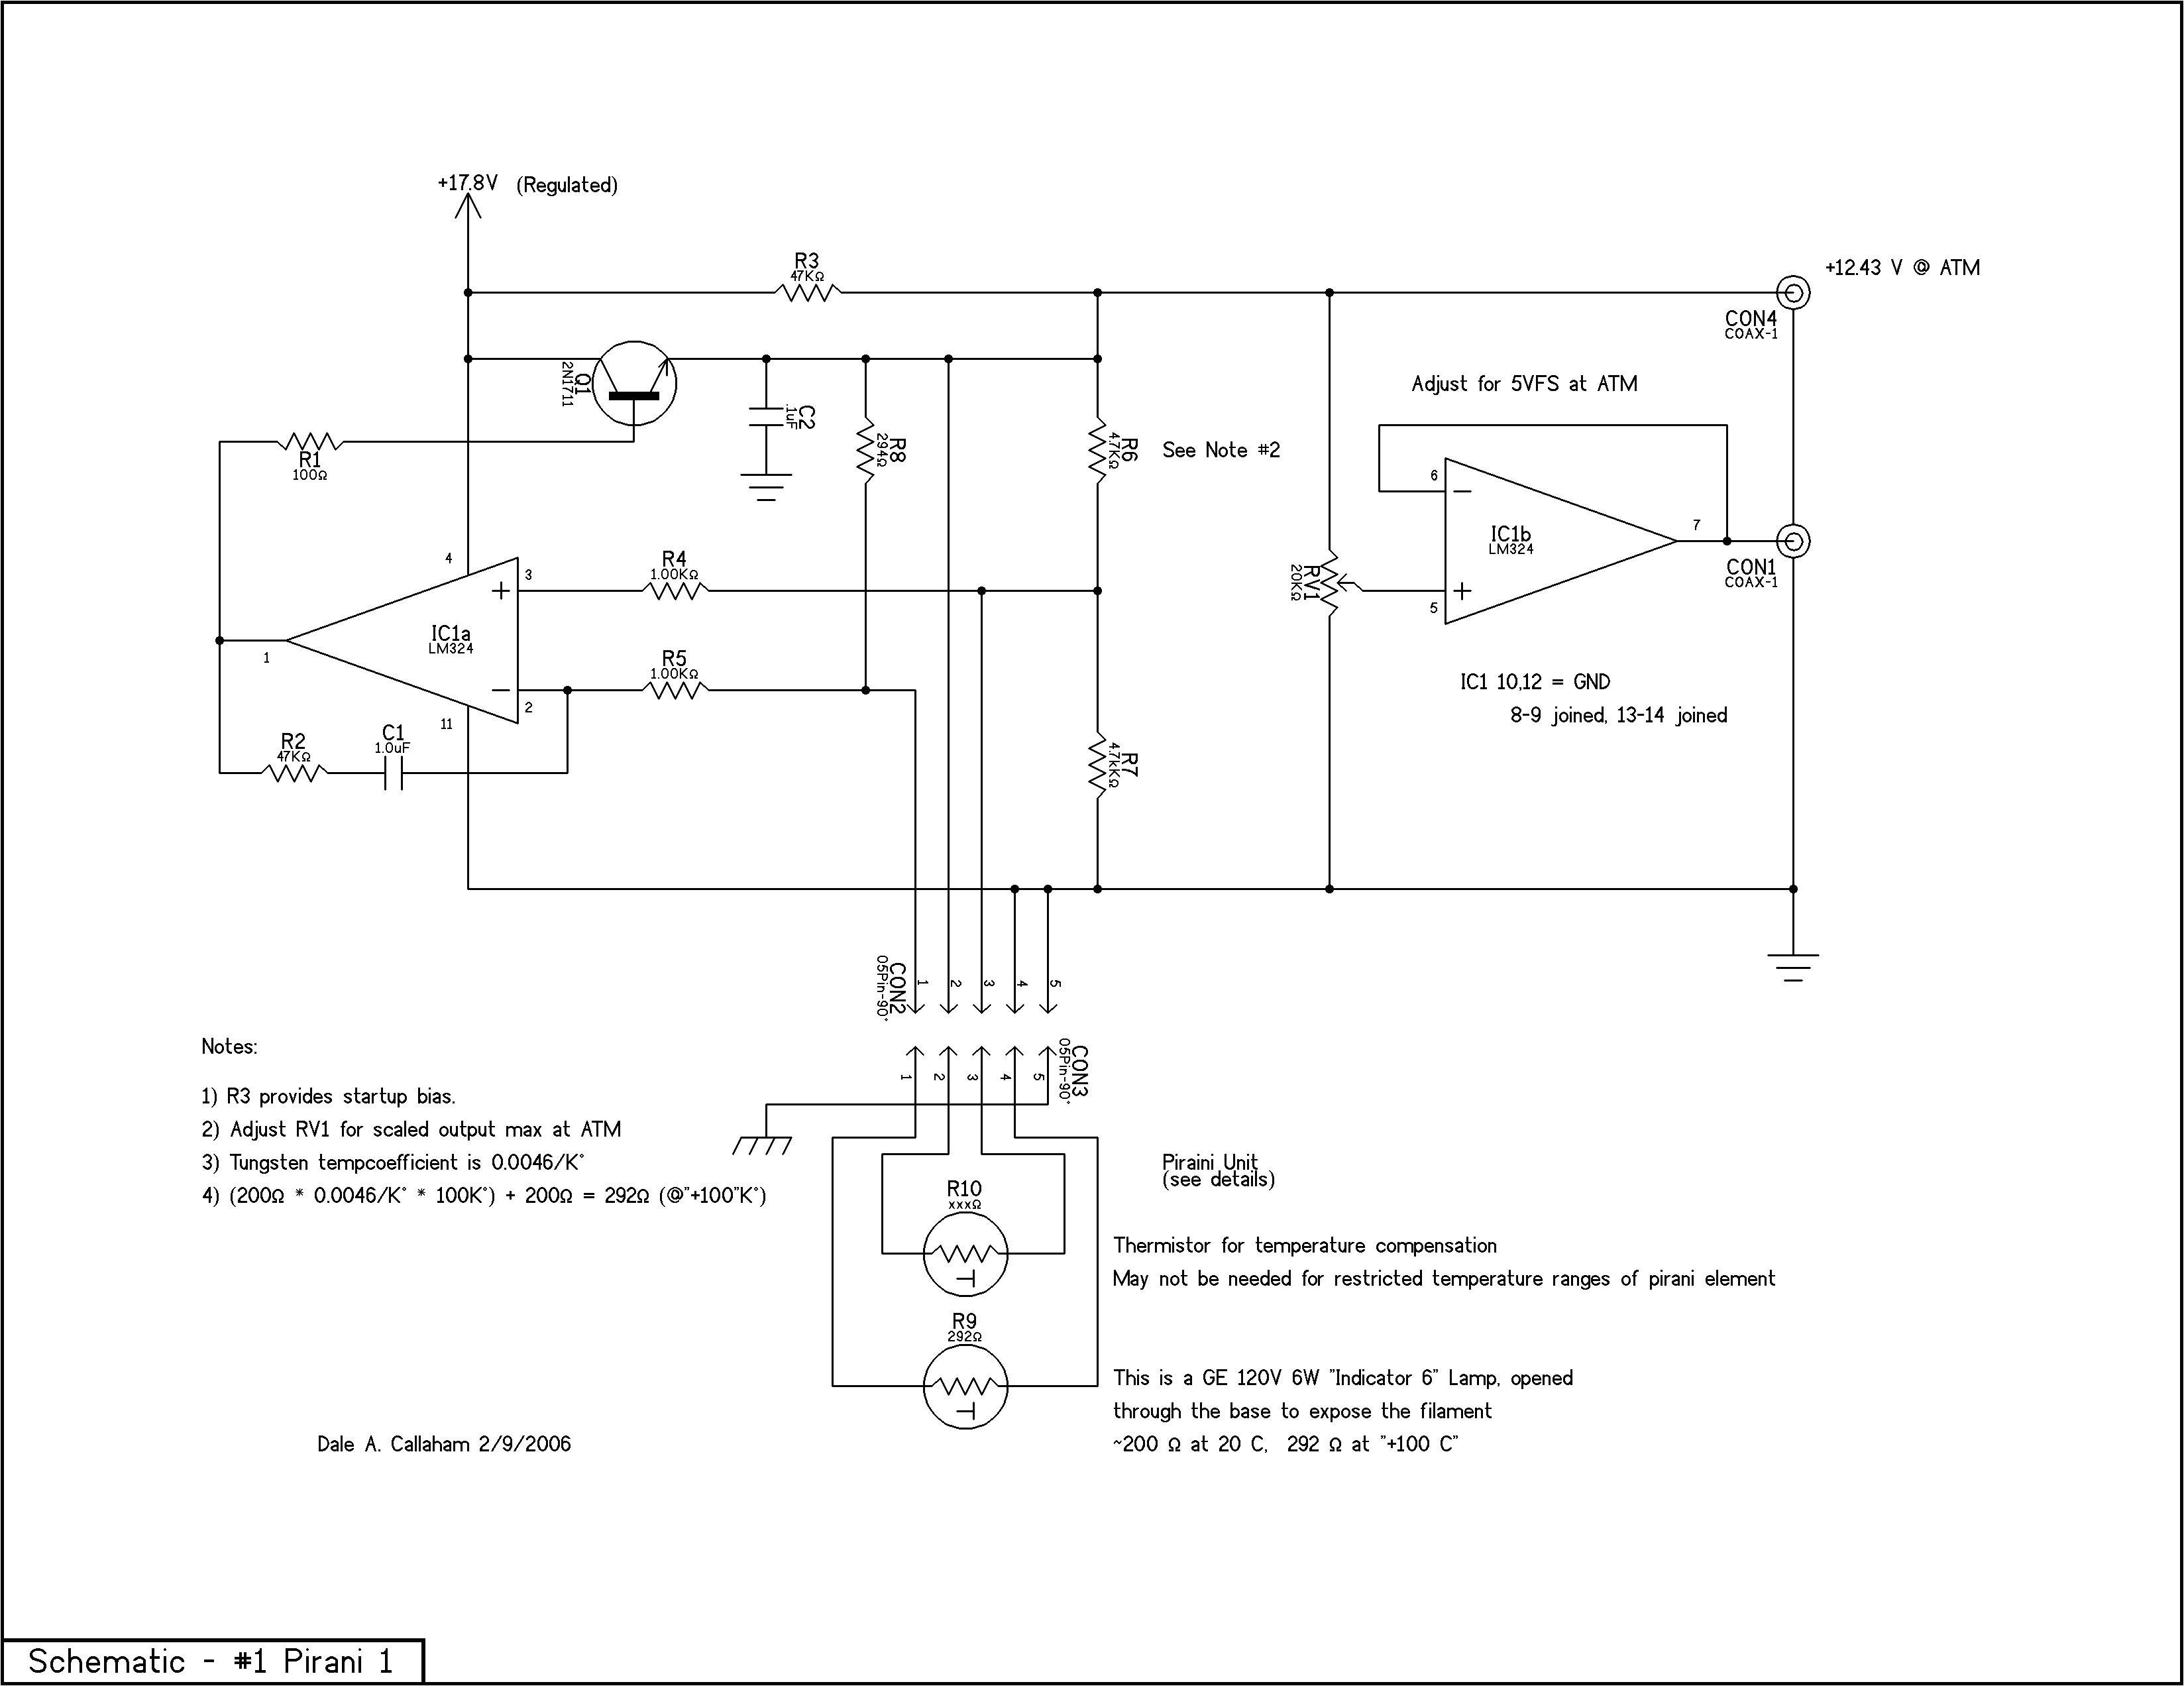 bmw e83 wiring diagram wiring diagram 2004 bmw x3 tail light wiring diagram 2004 bmw x3 wiring diagram